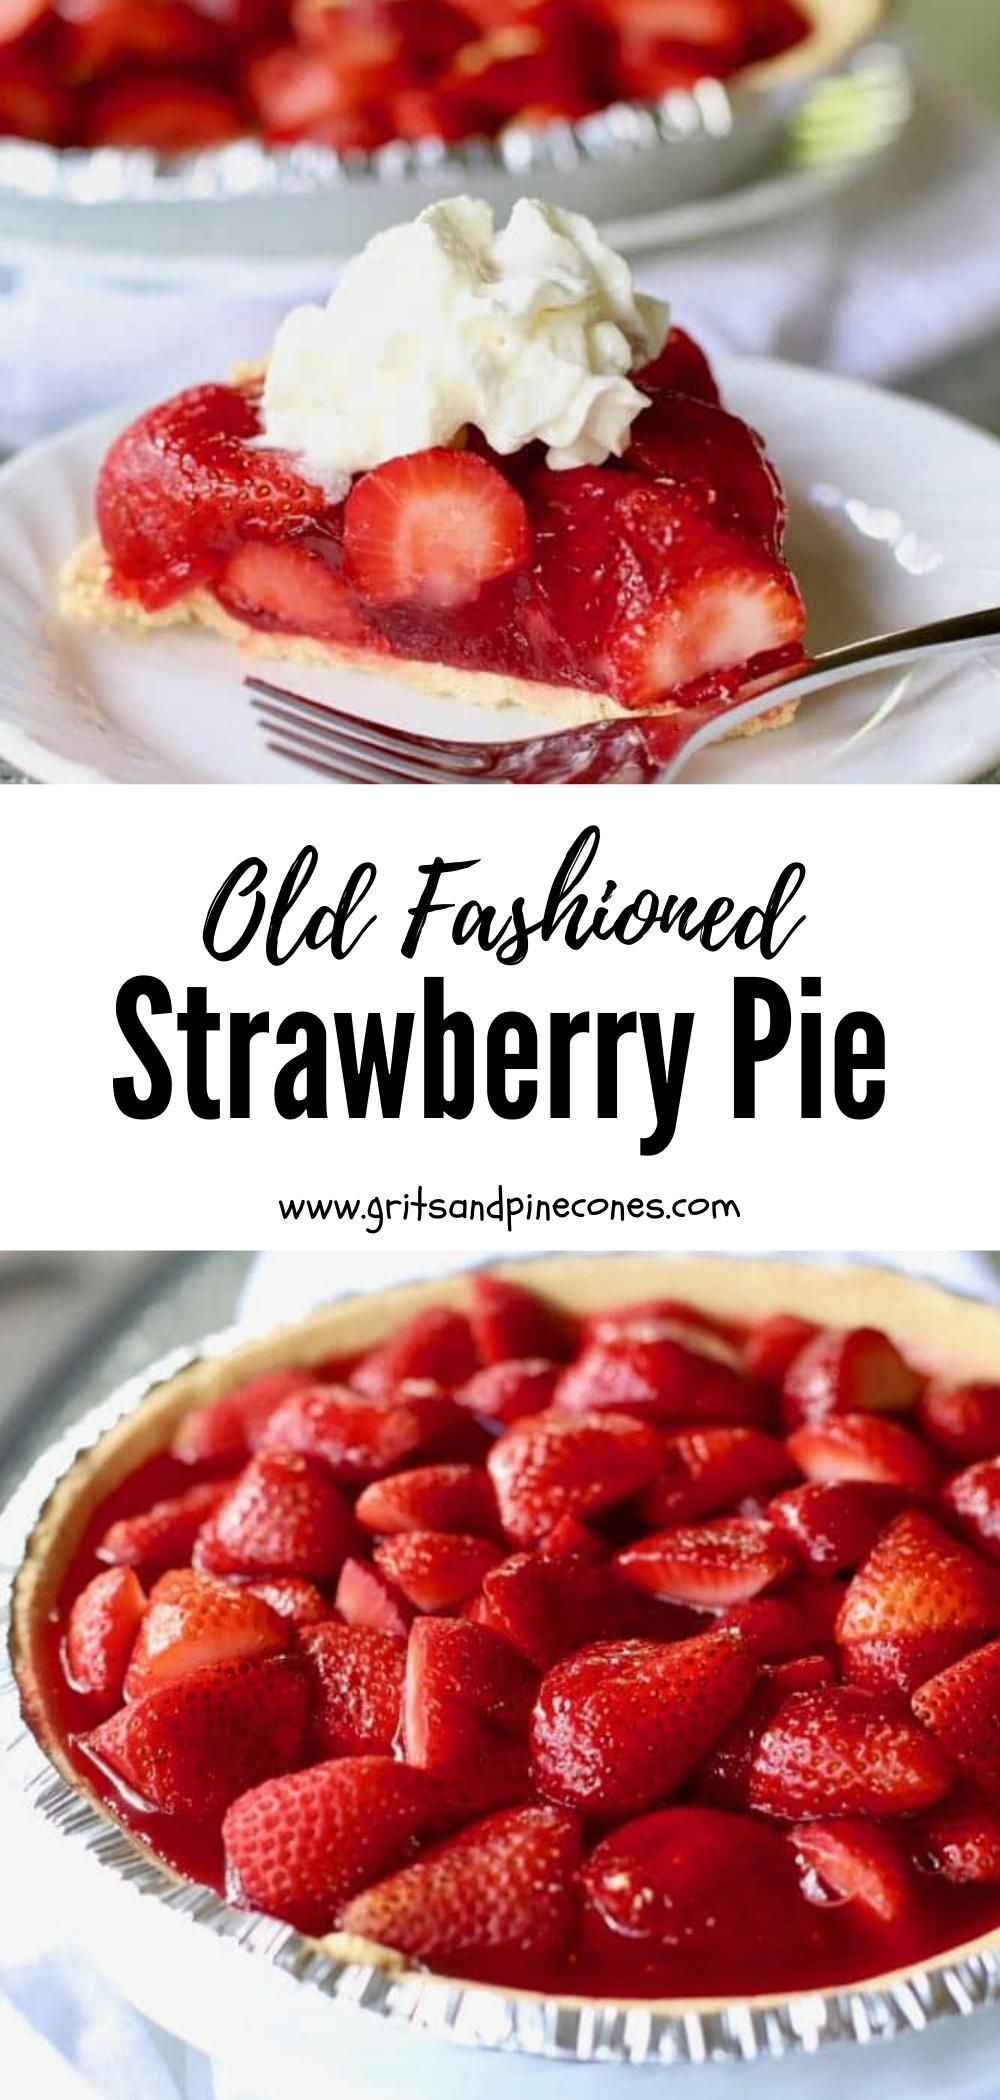 Old Fashioned Strawberry Pie With Jello Gritsandpinecones Com Recipe In 2020 Dessert Recipes Easy Strawberry Pie Strawberry Jello Pie